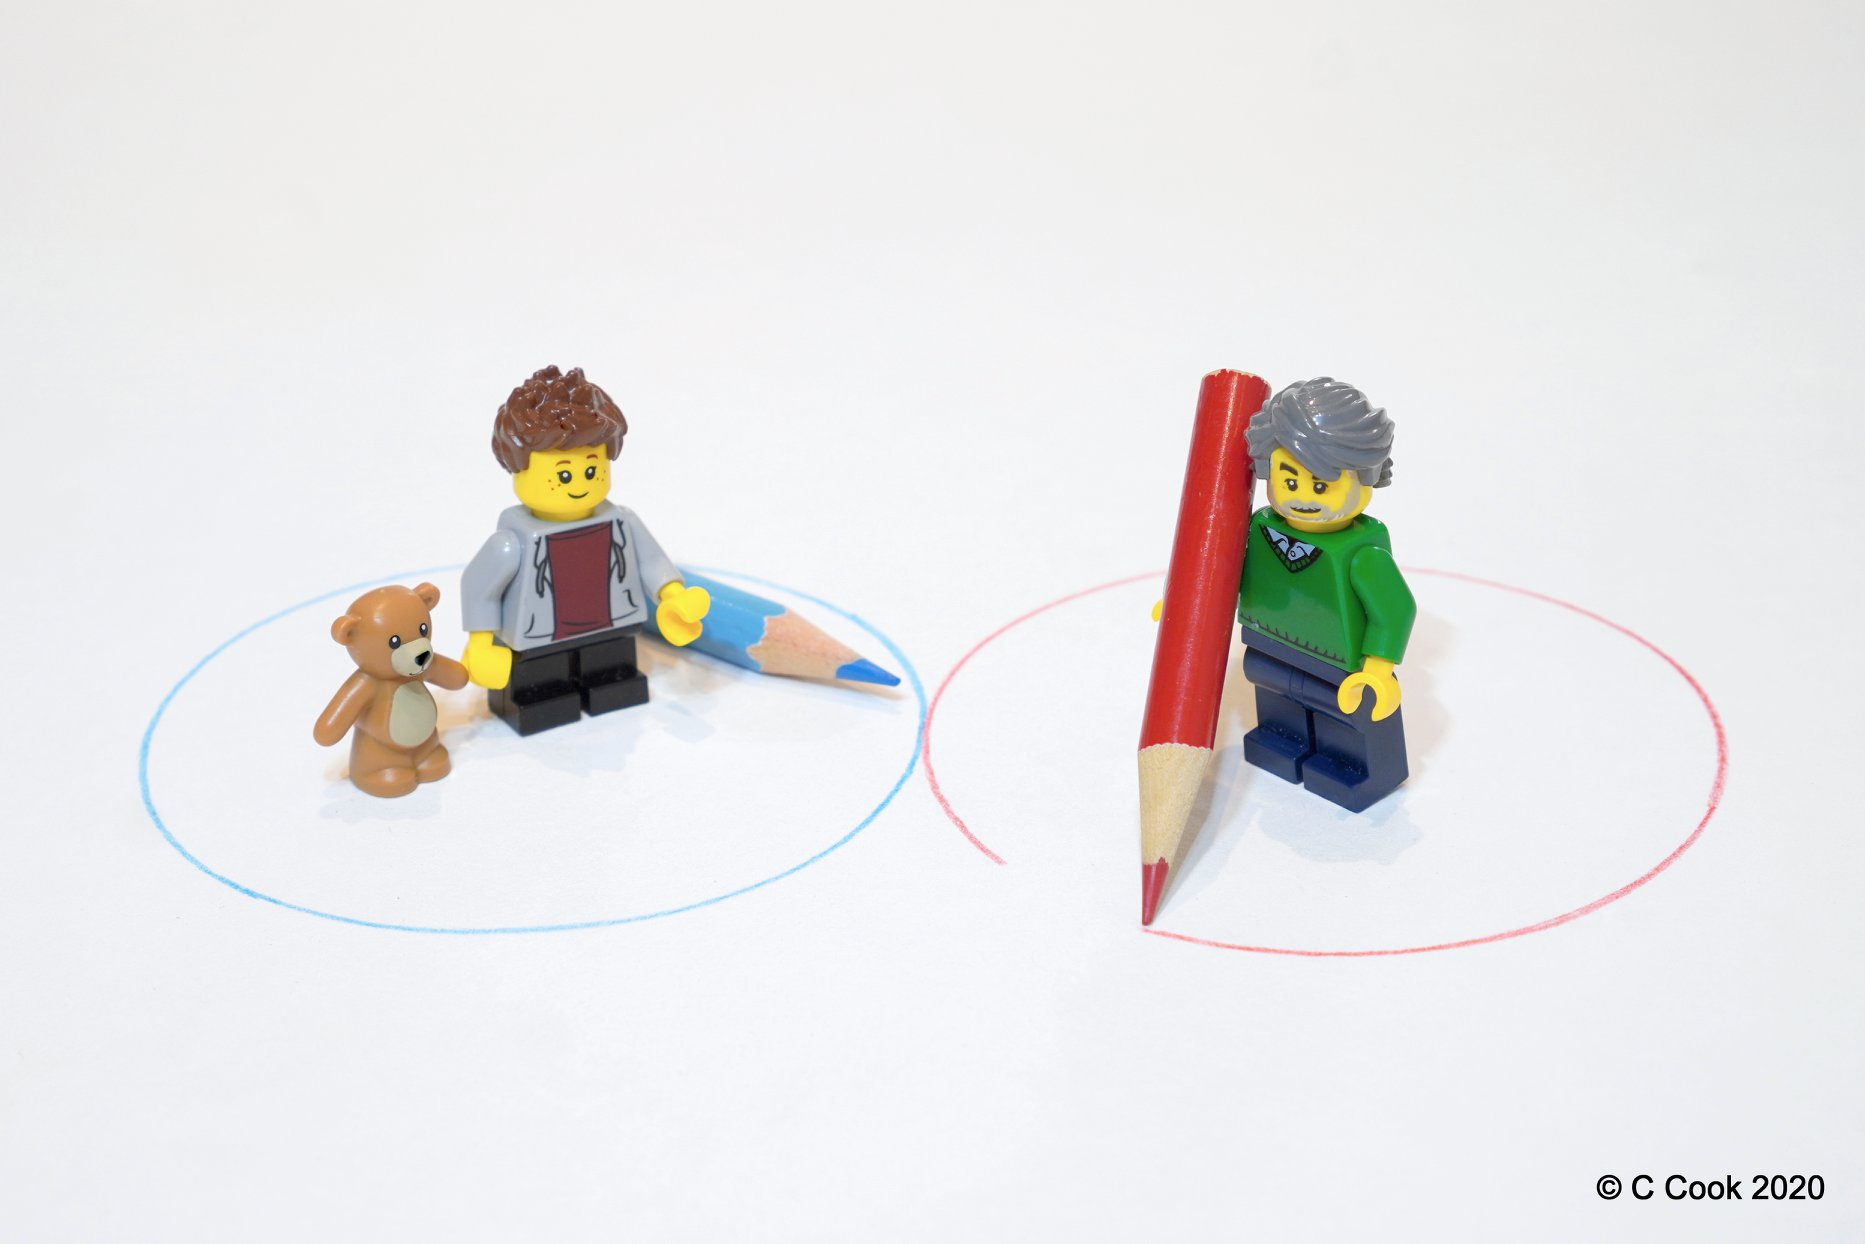 Lego social distancing